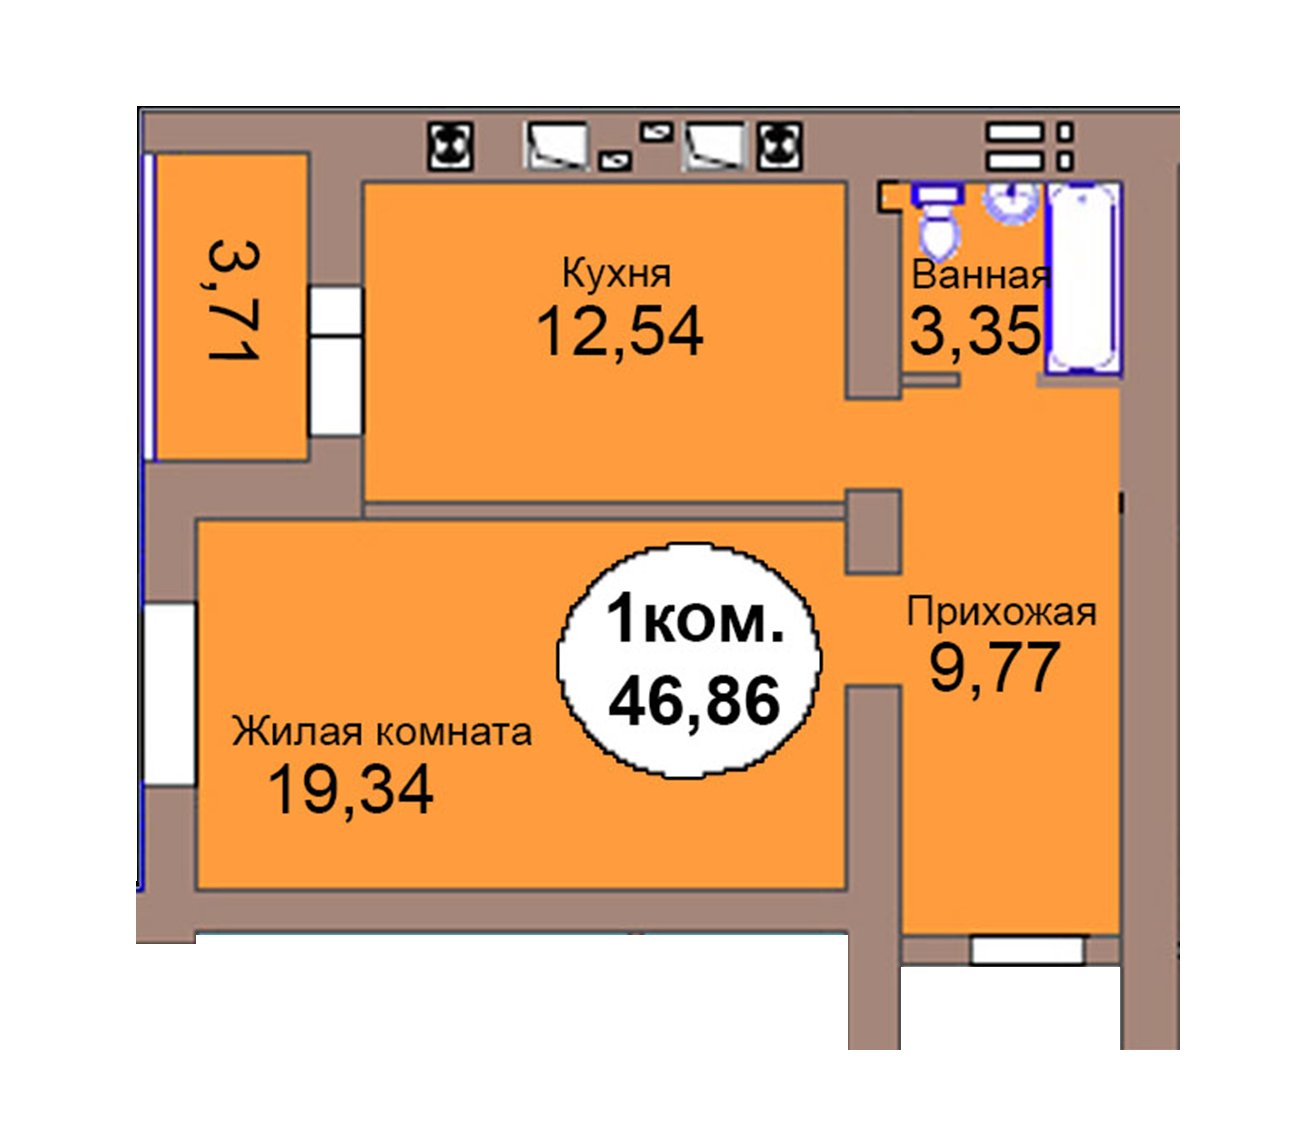 1-комн. кв. по пер. Калининградский, 4  кв. 107 в Калининграде